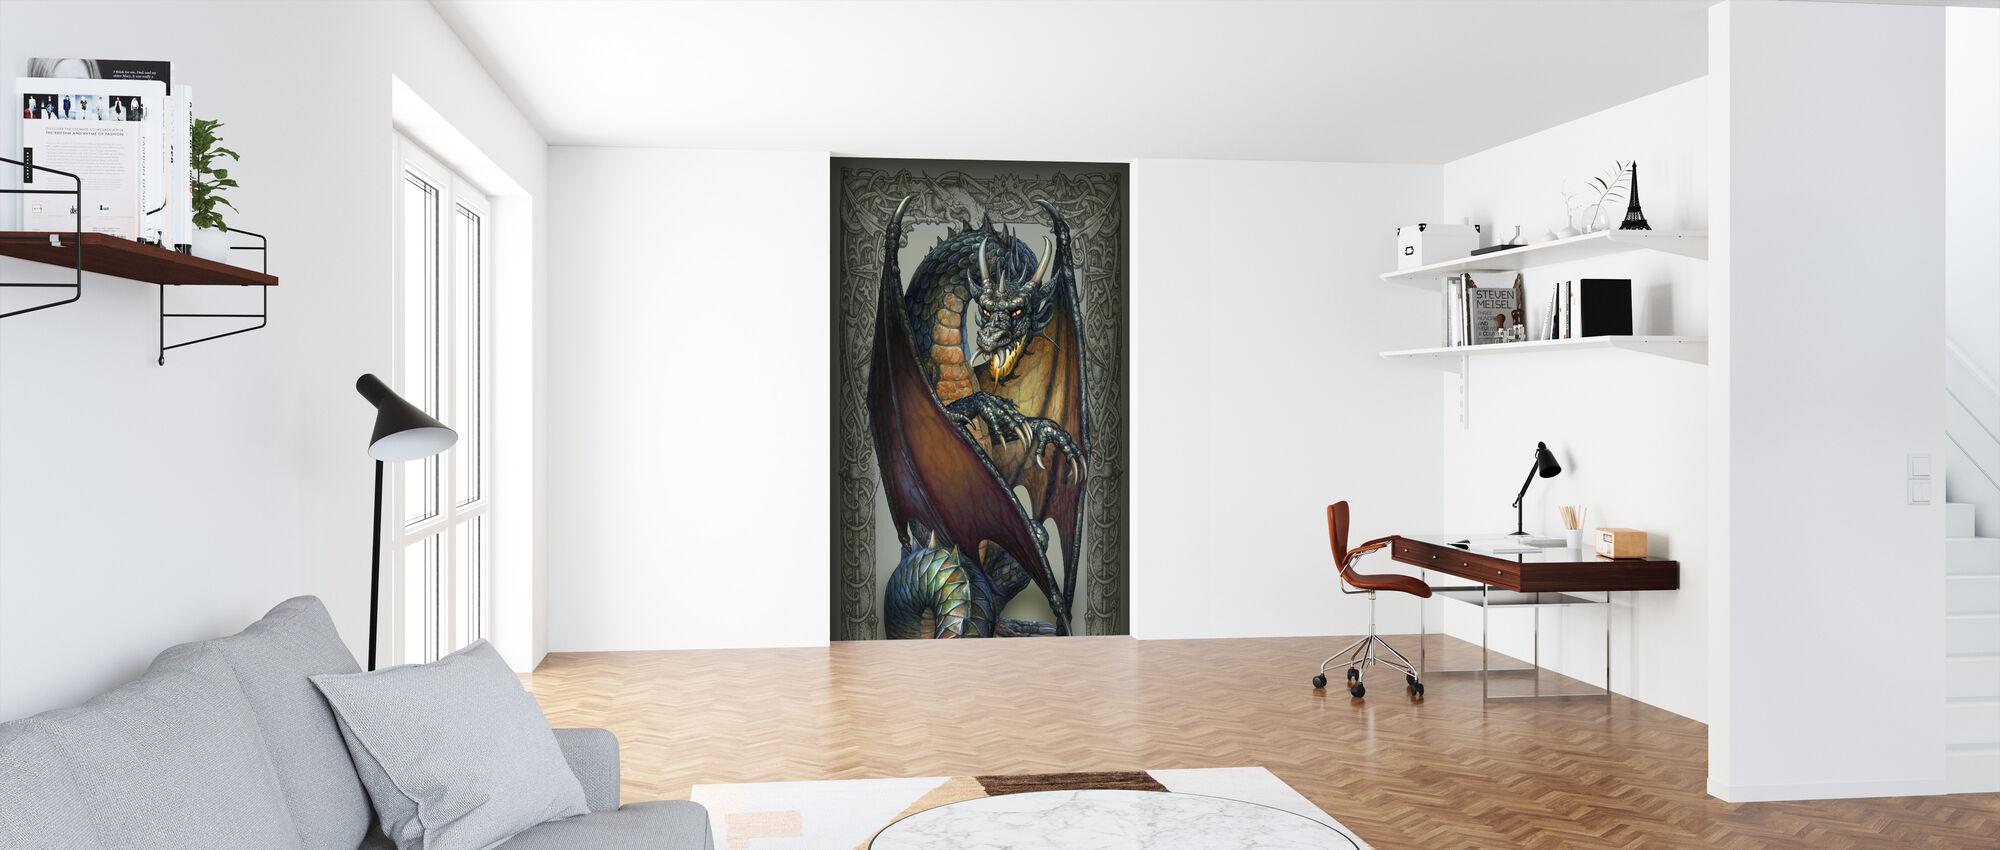 Earth Dragon - Wallpaper - Office